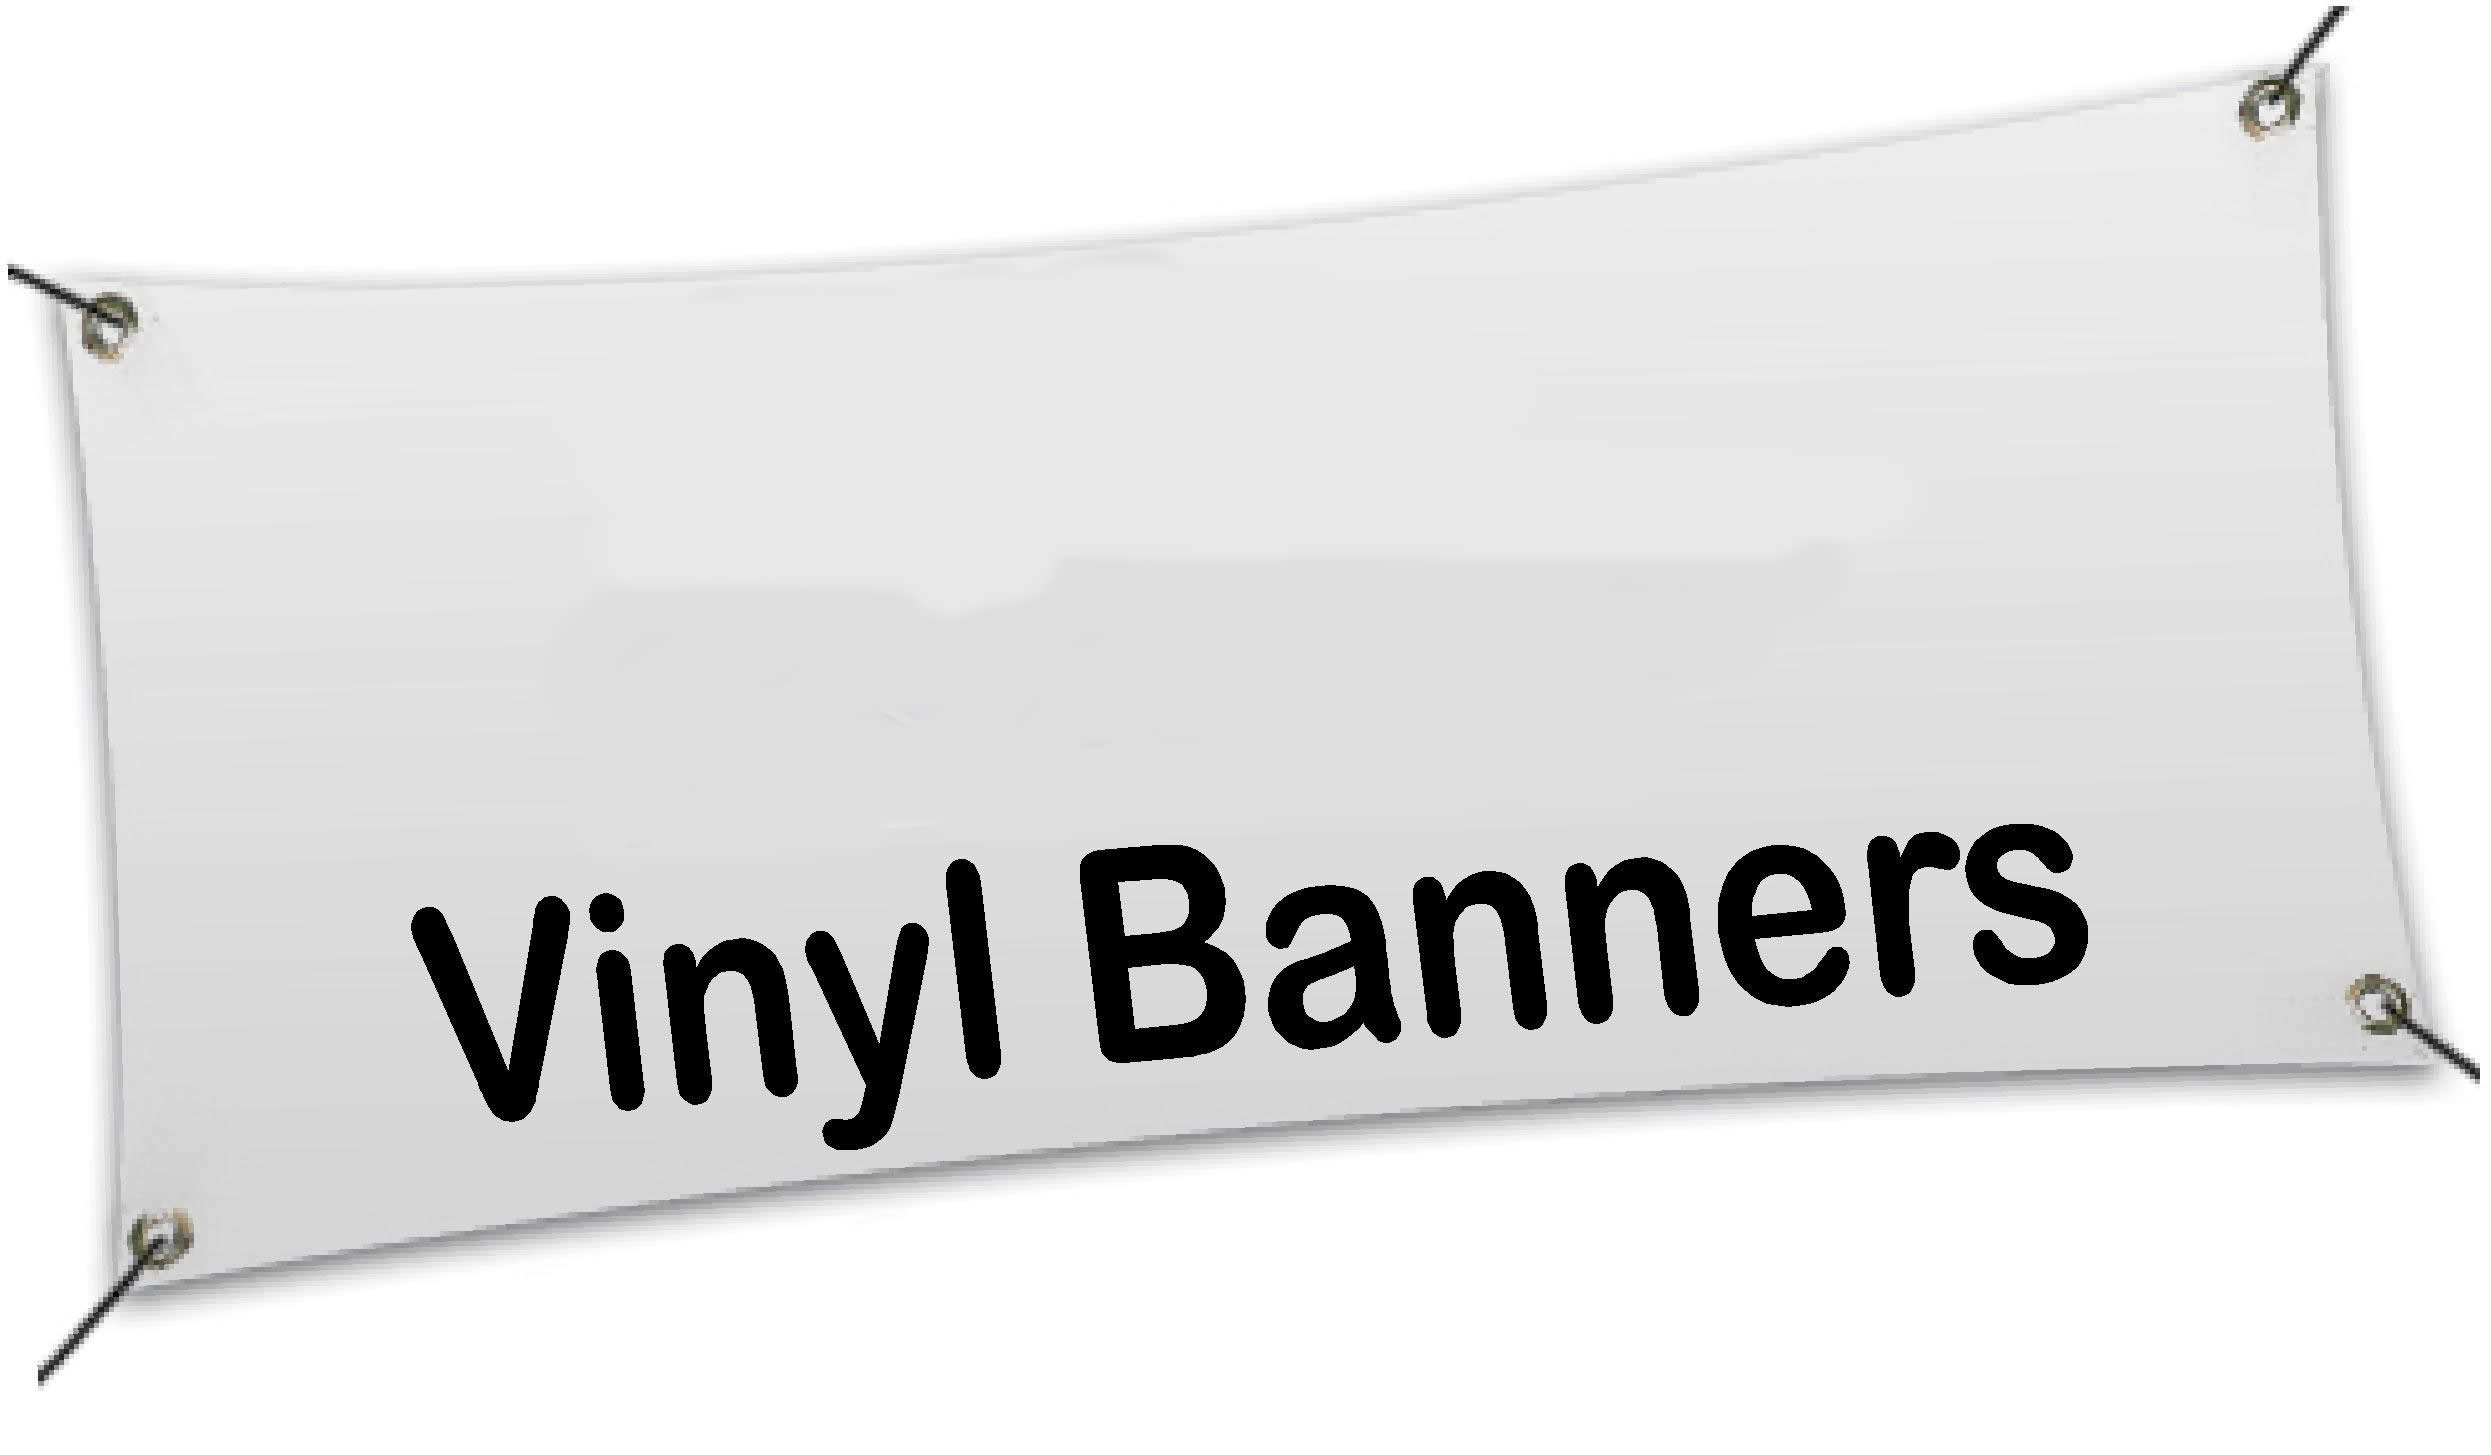 Vinyl Stickers Printing Sydney Vinyl Banners Printing - Vinyl banners australia